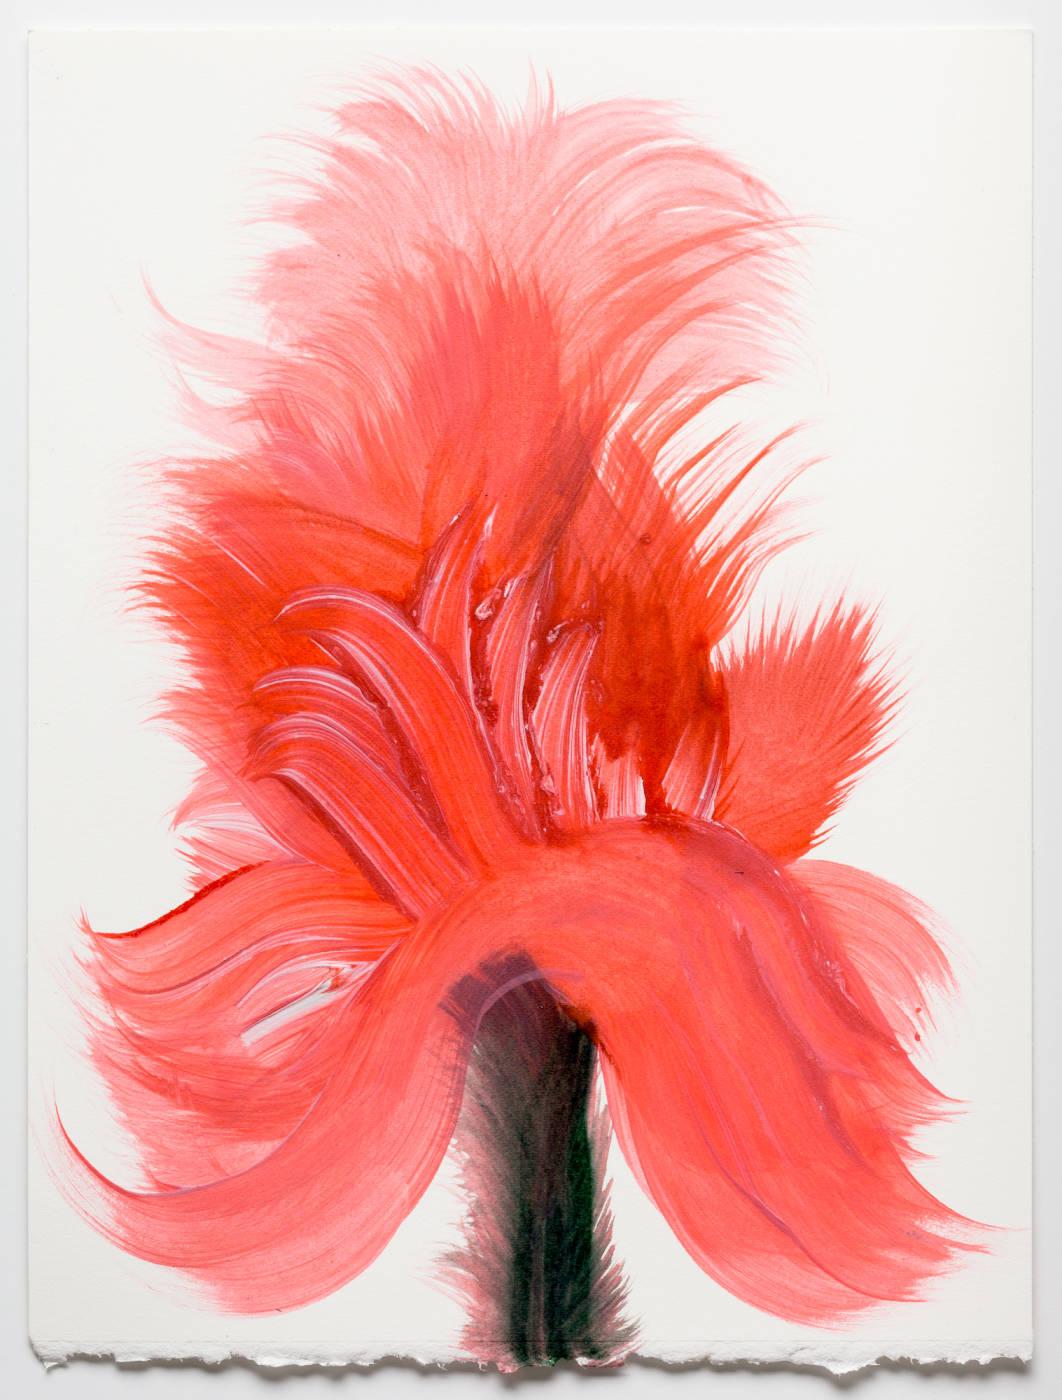 Coral Pink Flower 7